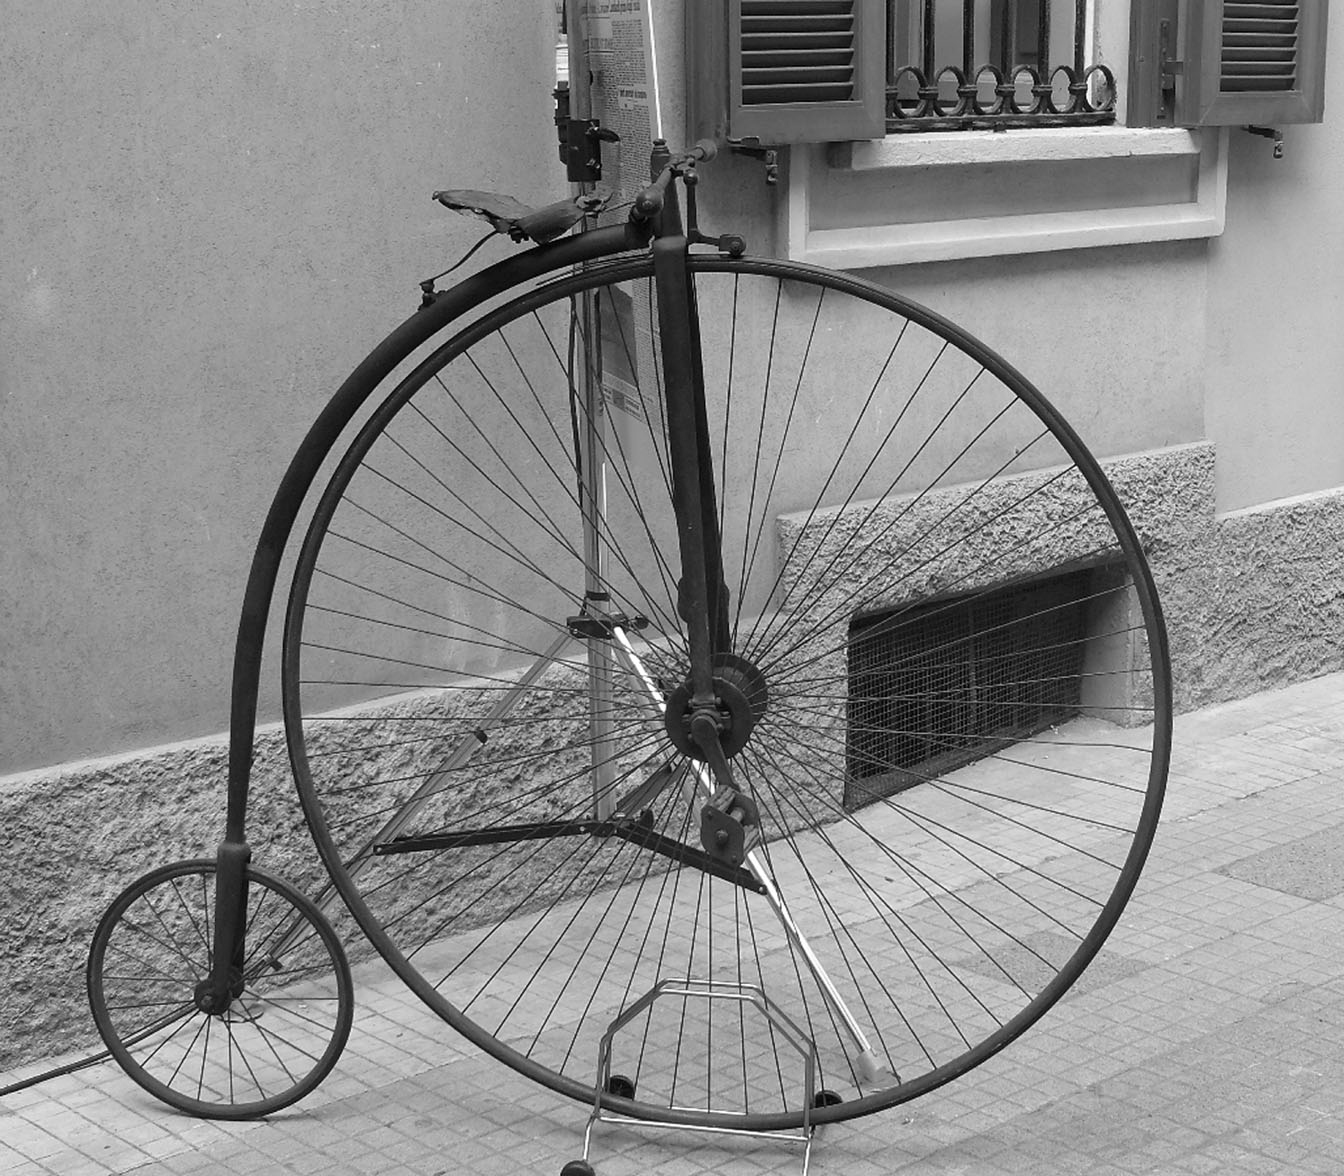 biciclo1